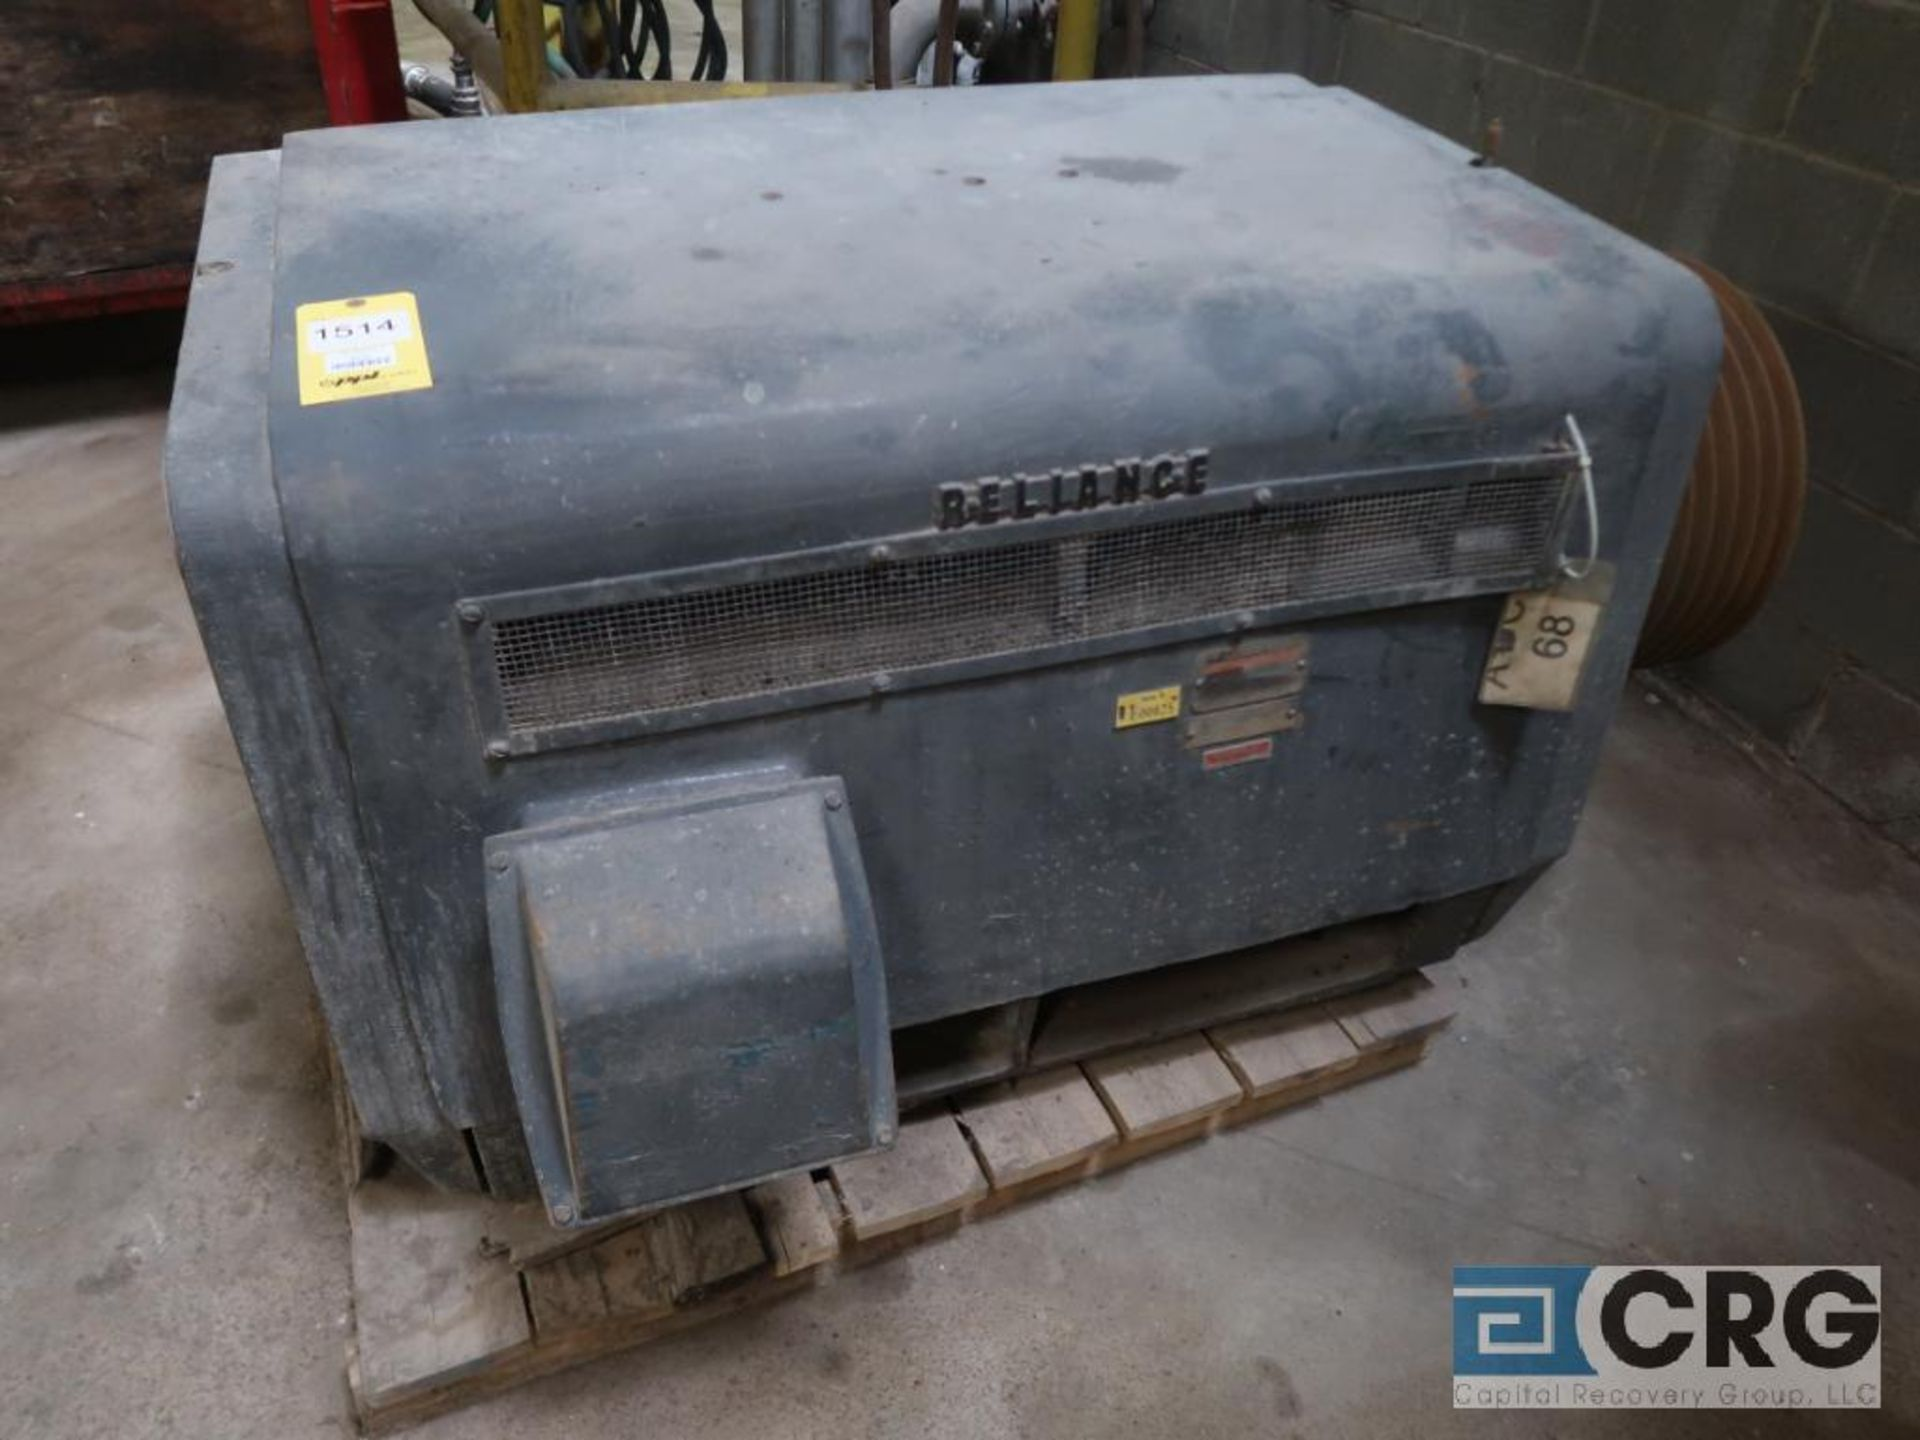 Reliance motor, 400 HP, 1,185 RPM, 2,600 volt, equipment #E00825 (496 Dock Area)